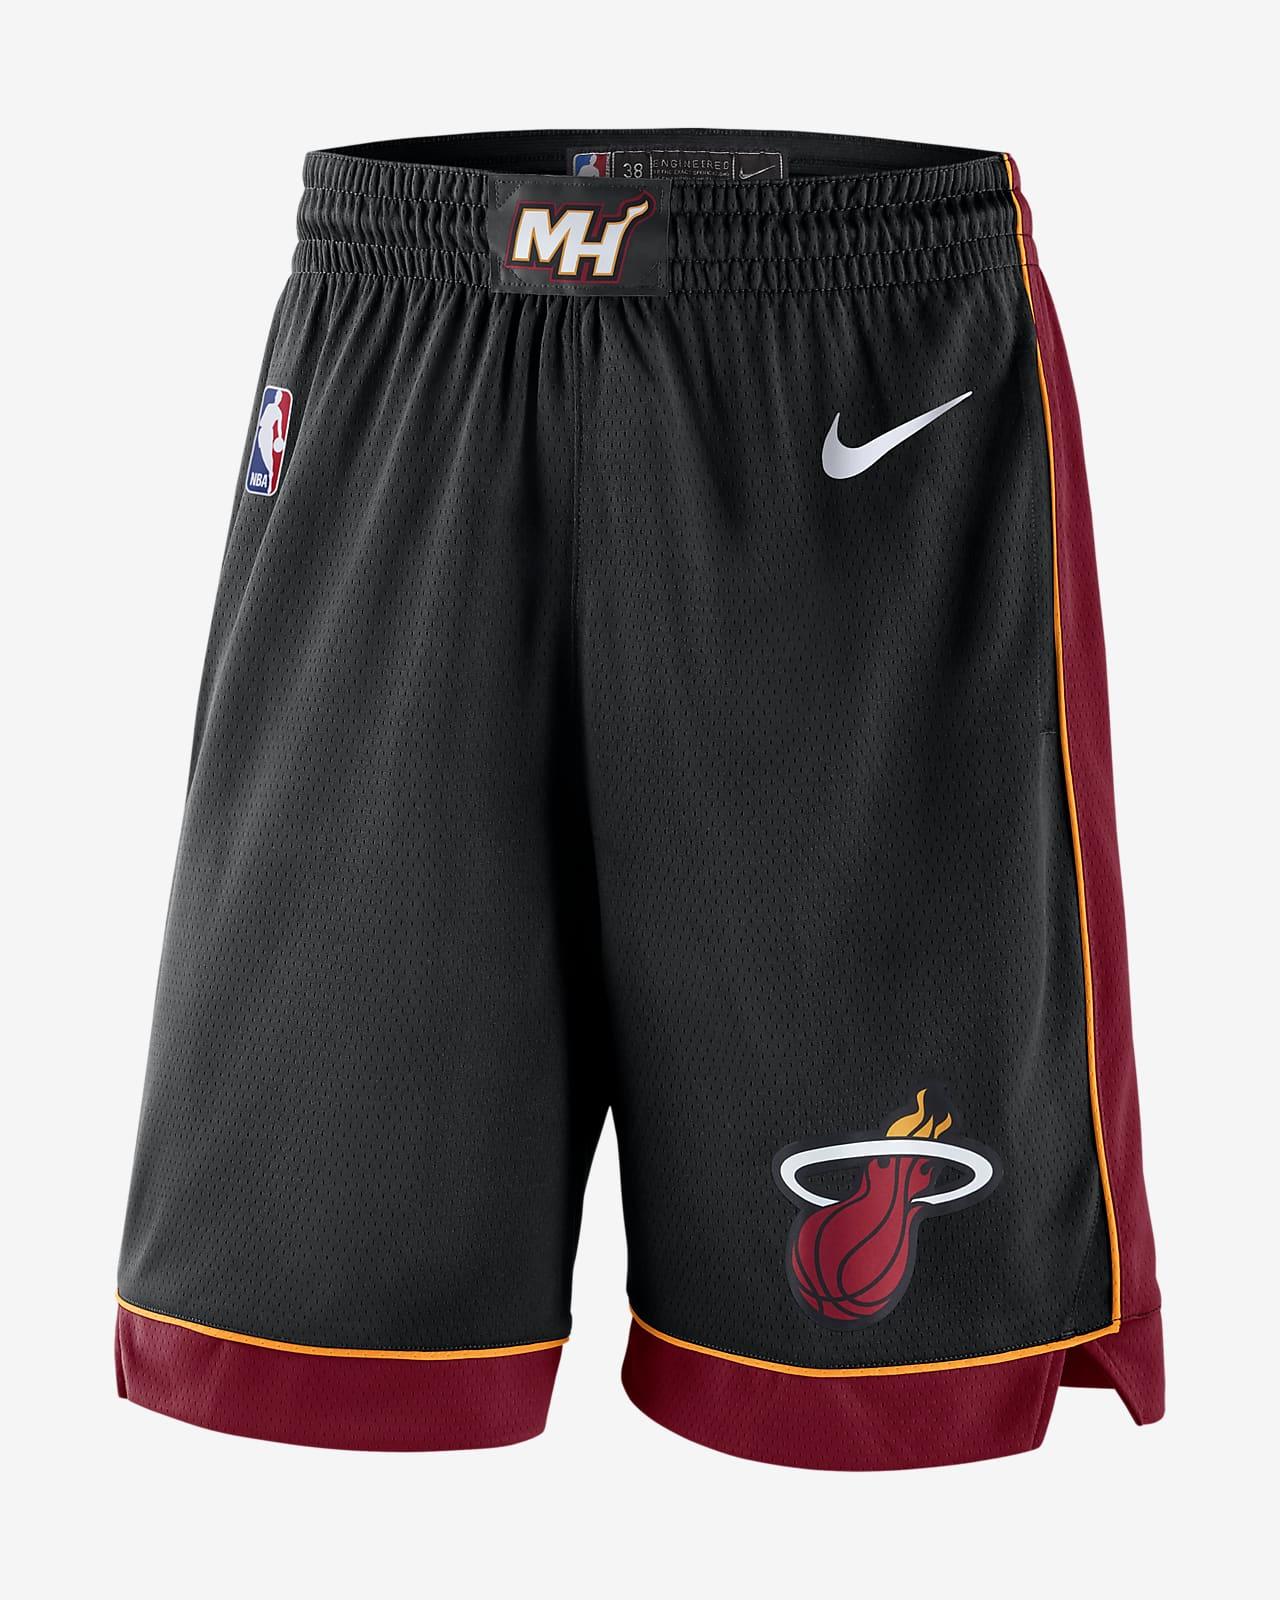 Miami Heat Icon Edition Nike NBA Swingman Erkek Şortu